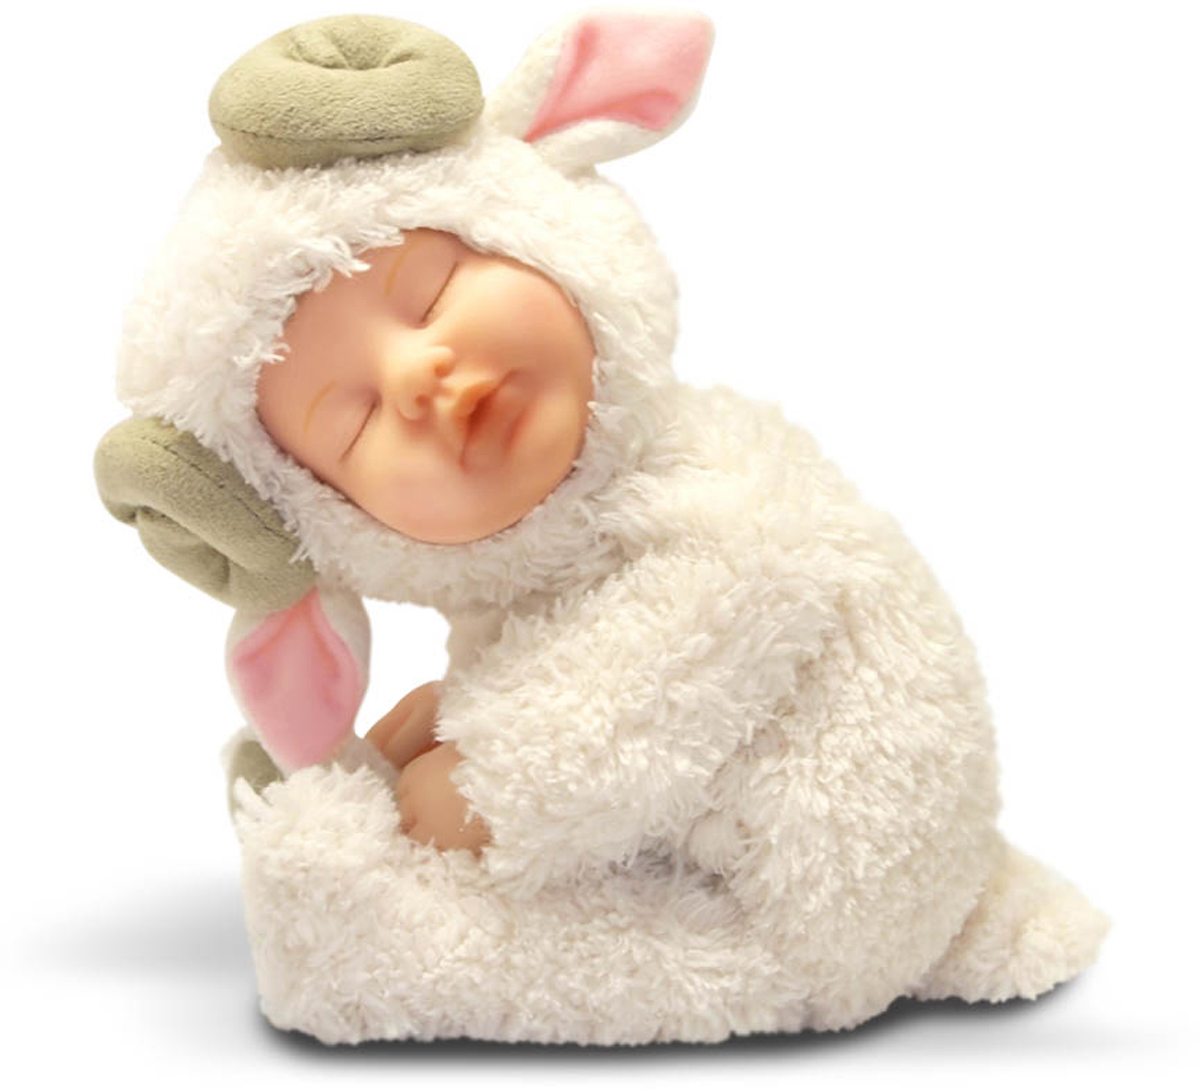 Ovation Anne Geddes Кукла Знаки зодиака Овен